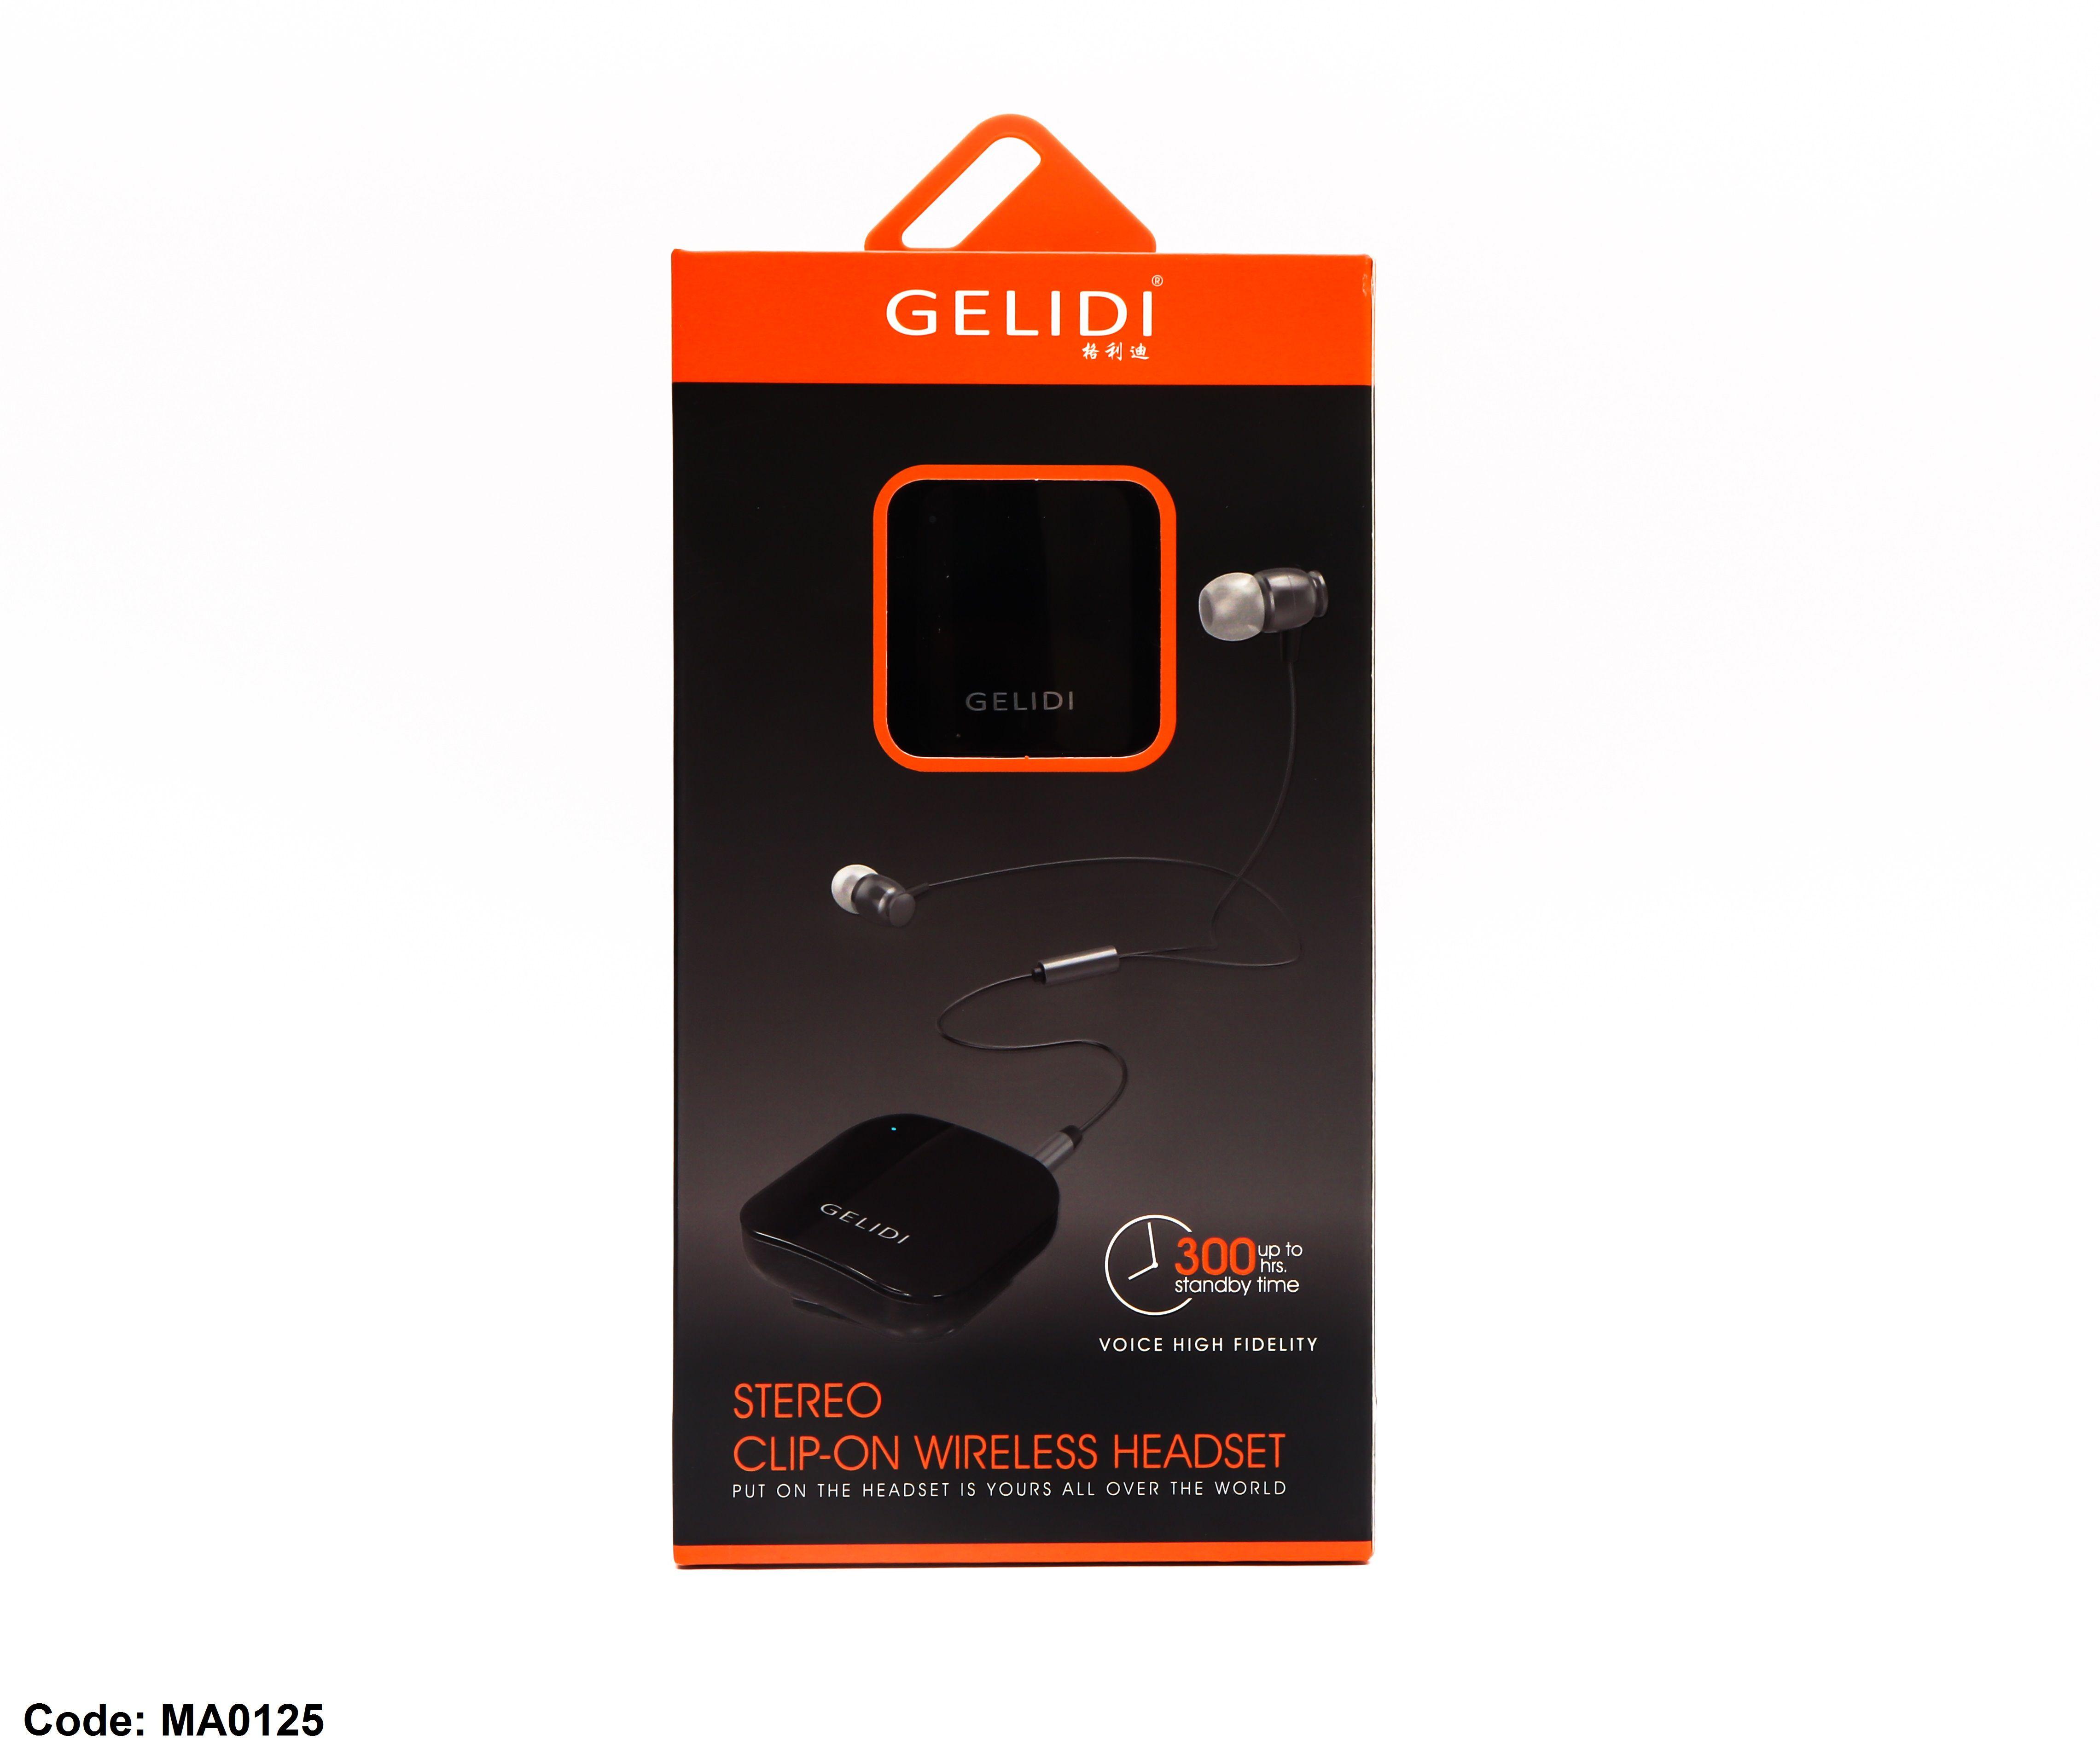 Bluetooth Headphones Langsdom بسعر 180ج بدل من 250ج Phone Accessories Can Opener Coding